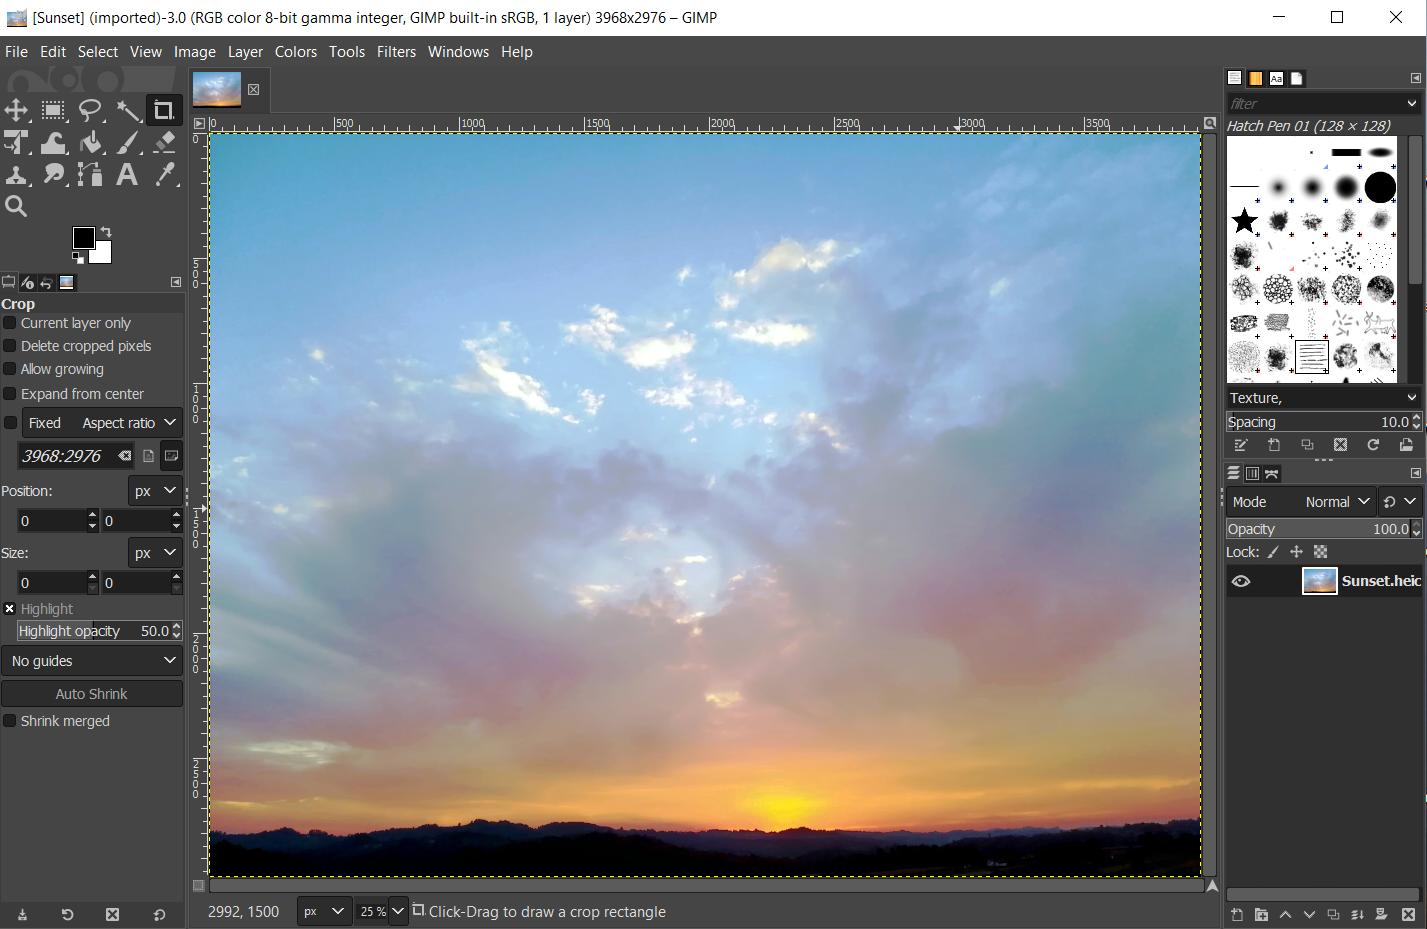 Best image file formats - HEIC